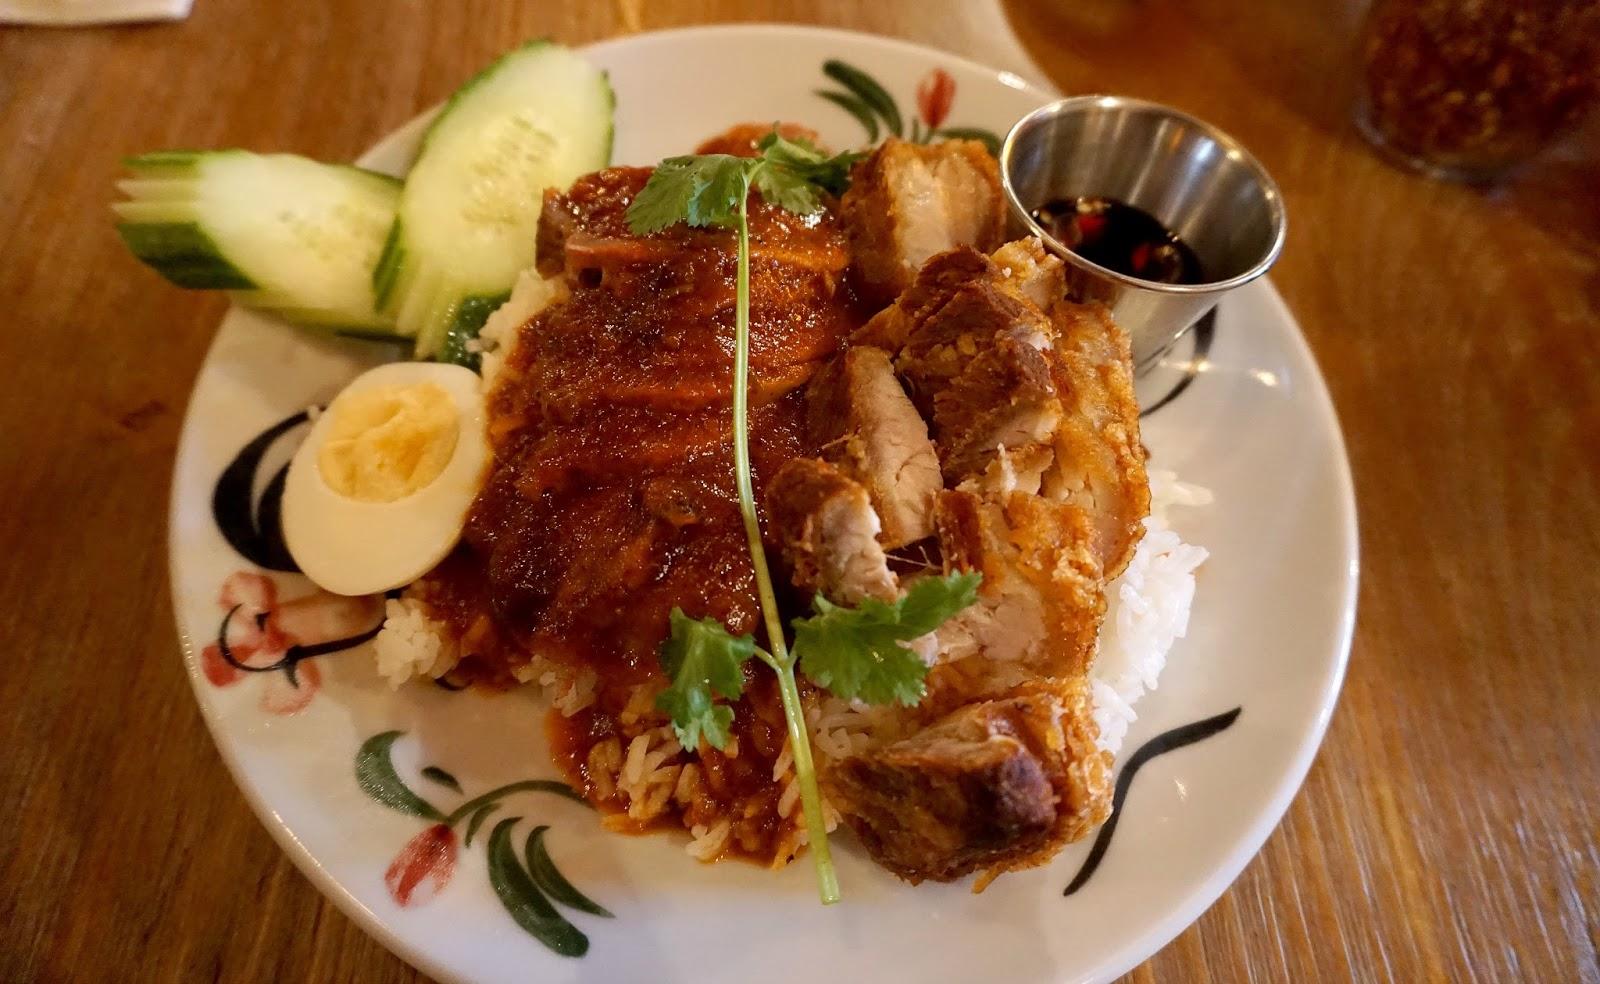 Thaikhun Khao Moo Daeng Moo Grob